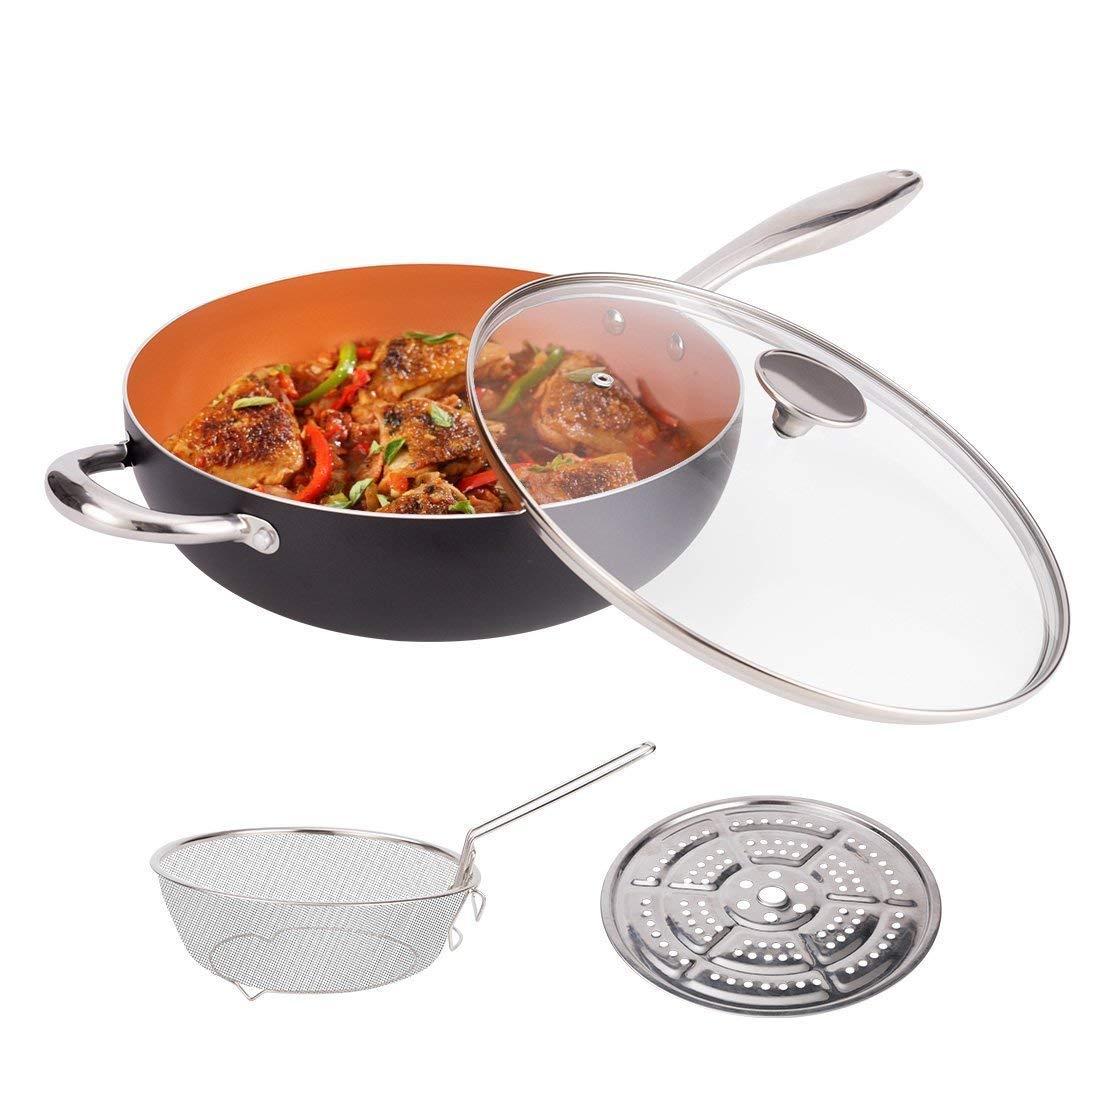 MICHELANGELO 5 Quart Nonstick Woks and Stir Fry Pans With Lid, Frying Basket Steam Rack, Nonstick Copper Wok Pan With Lid, Ceramic Wok With Lid, Nonstick Frying Wok, Induction Compatible (Renewed)